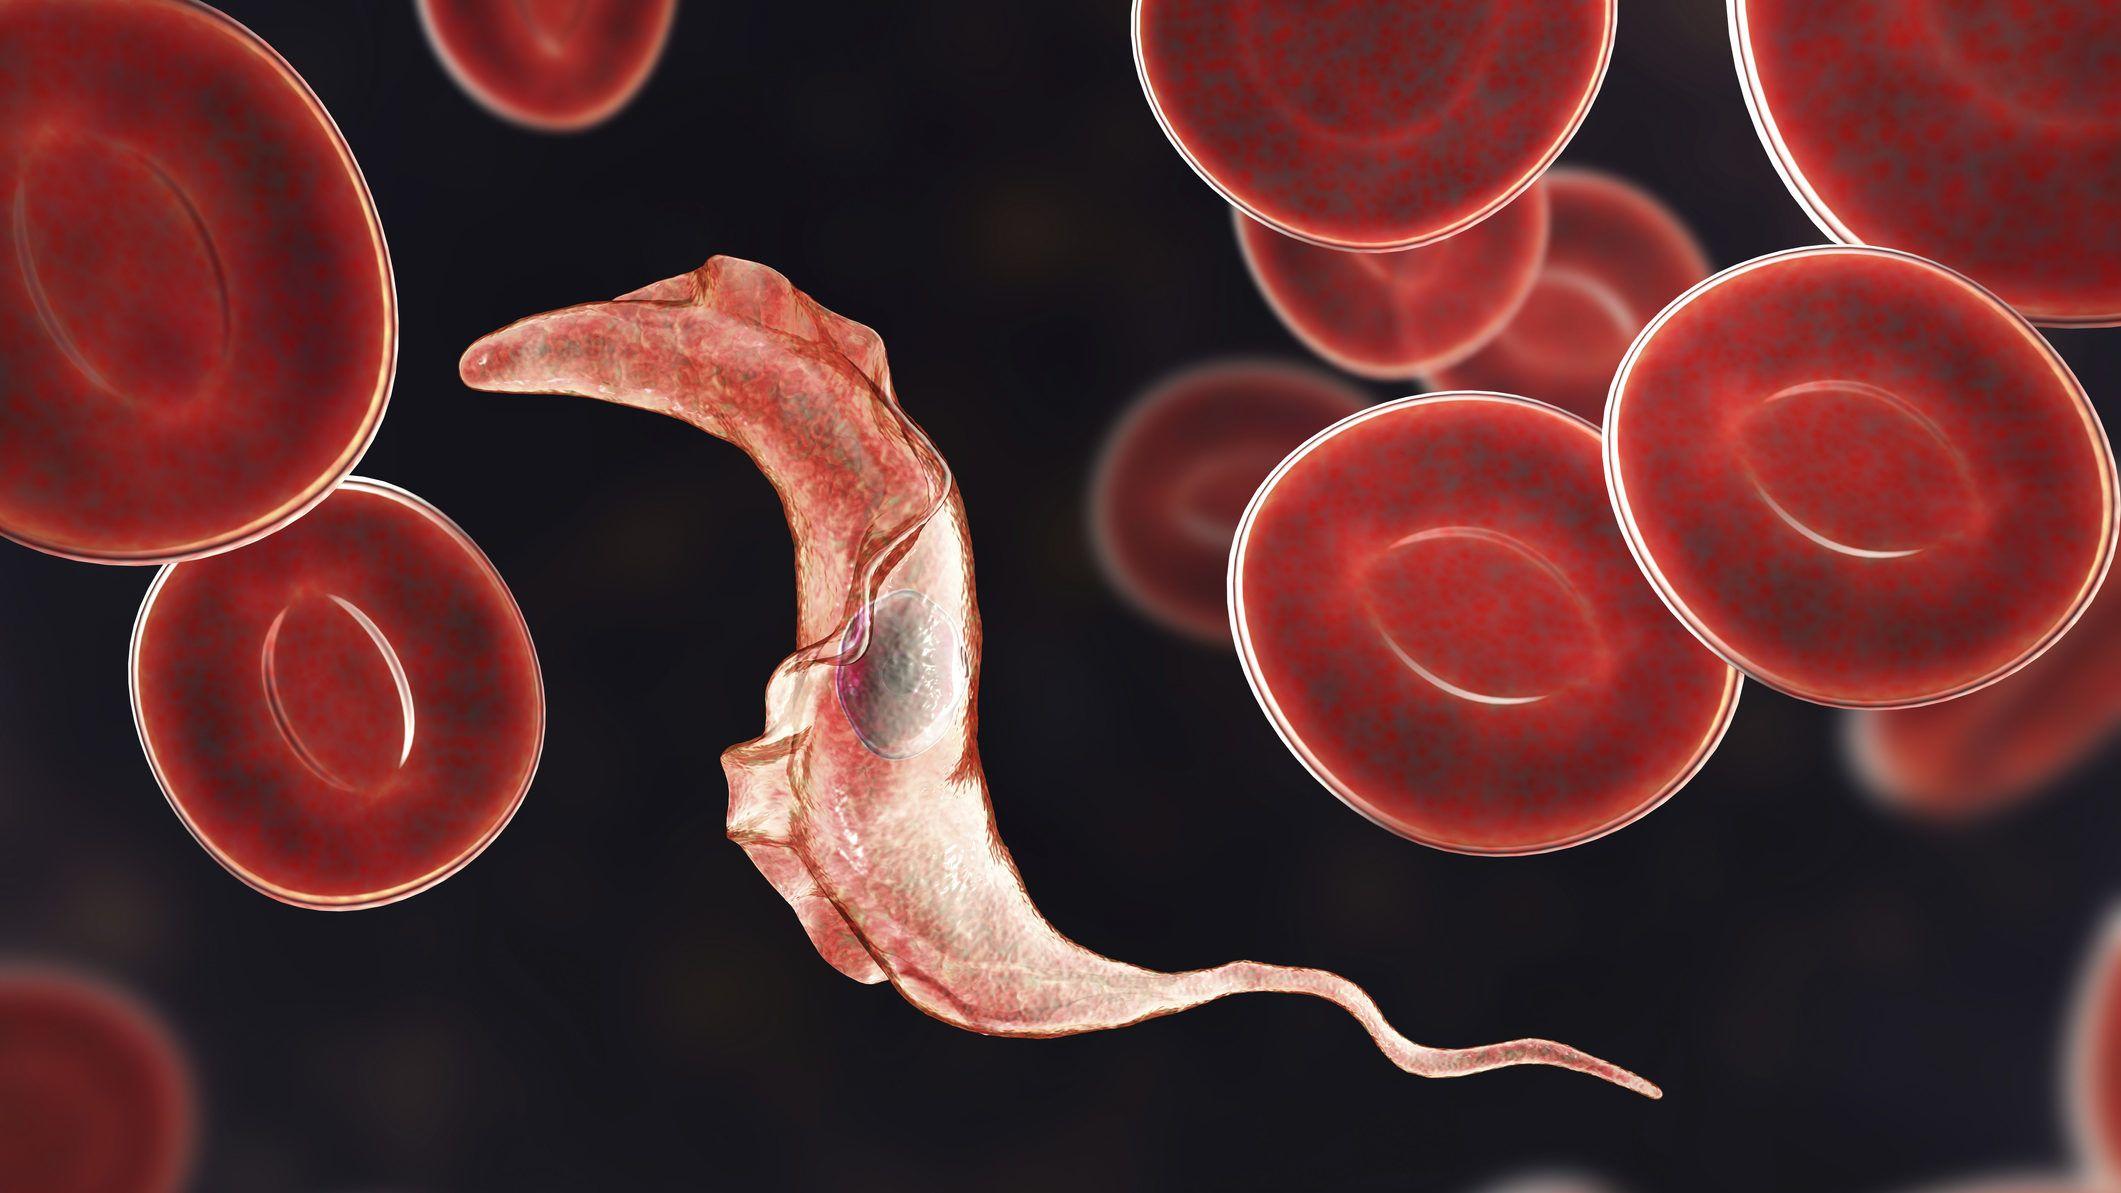 parazita kód herpetiform dermatitis duhring